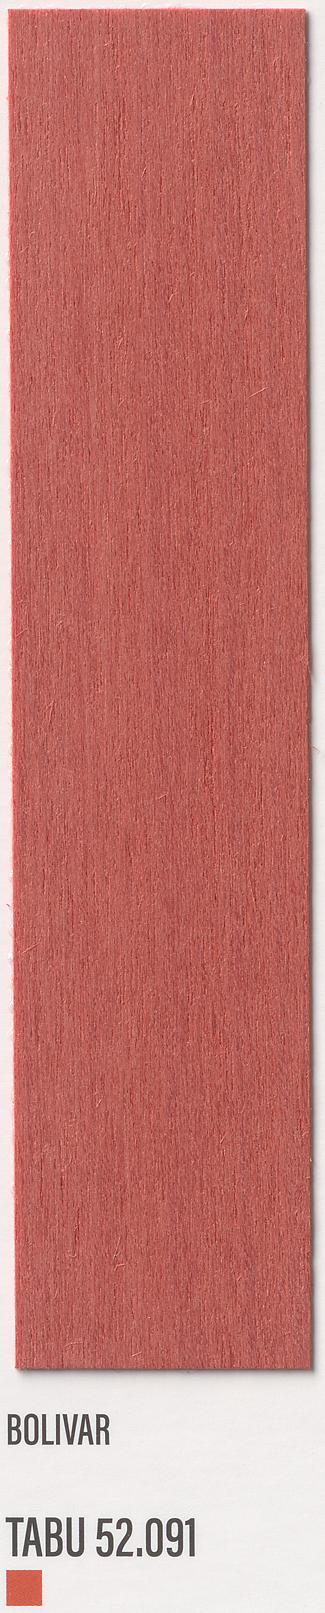 C71-(300dpi)(20181031)